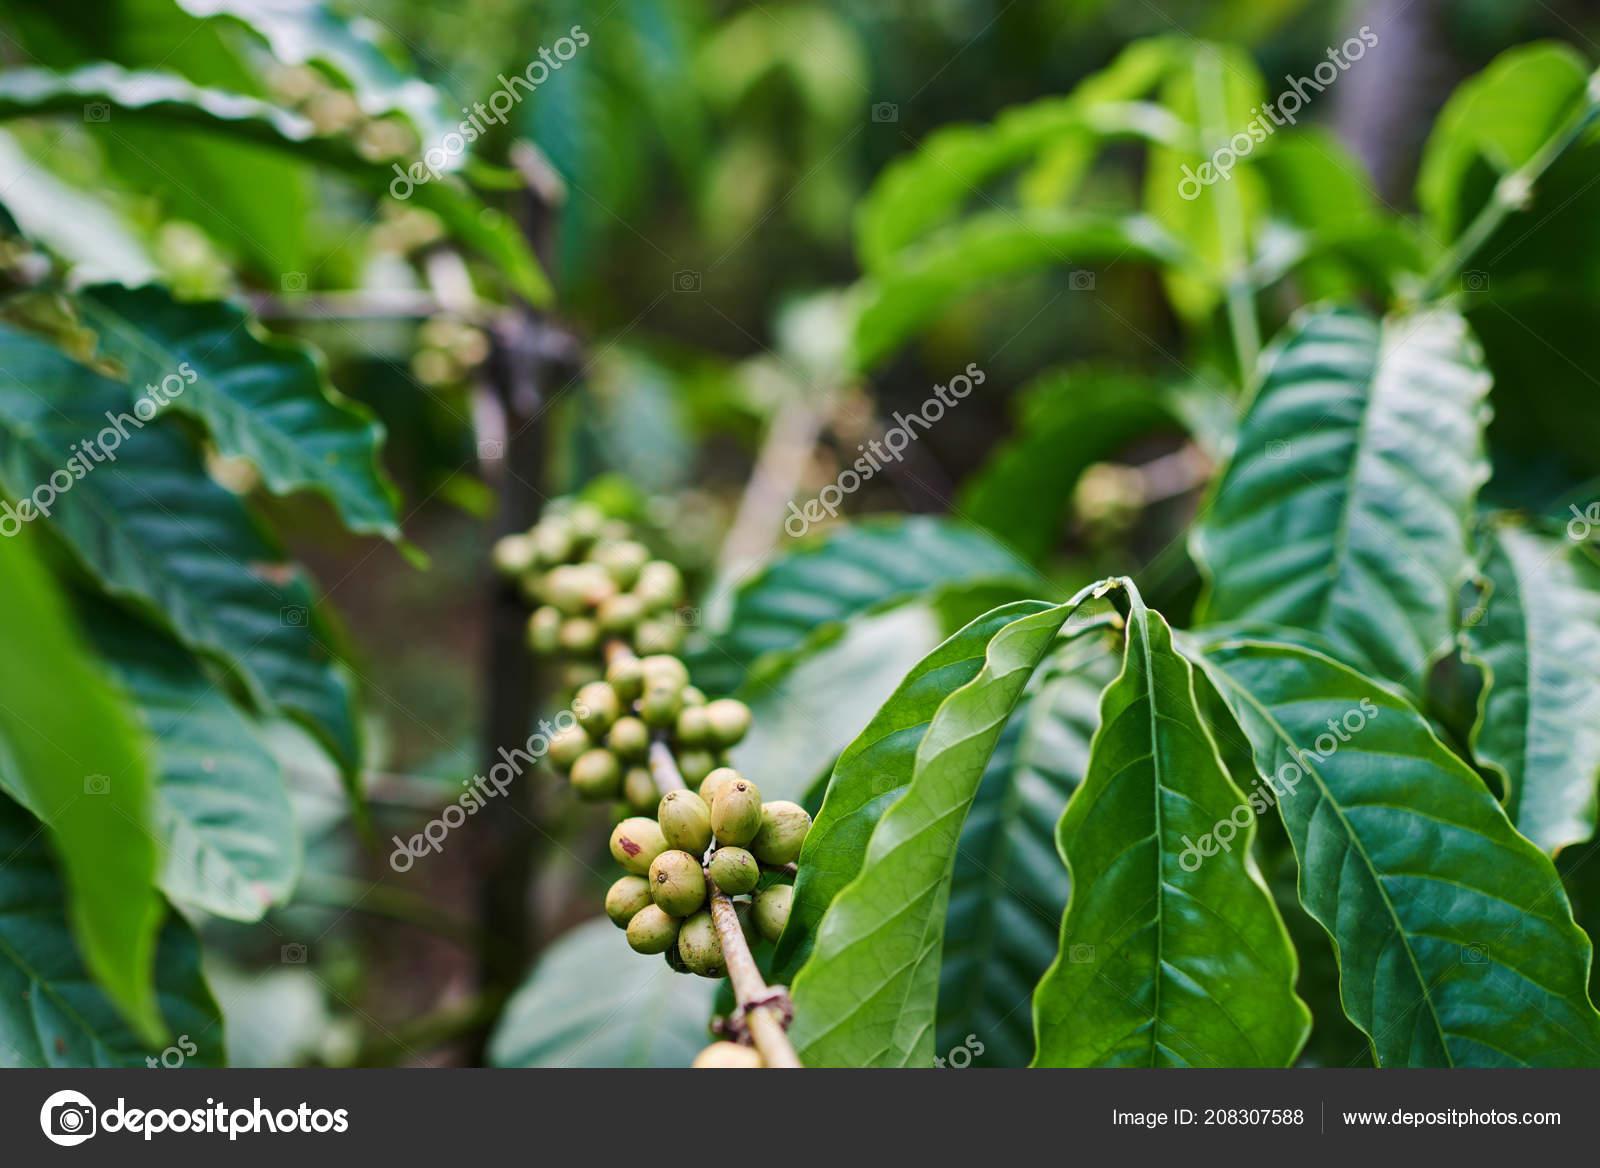 Raw Green Coffee Beans Tree Plantation Plants Leaf Berries Close